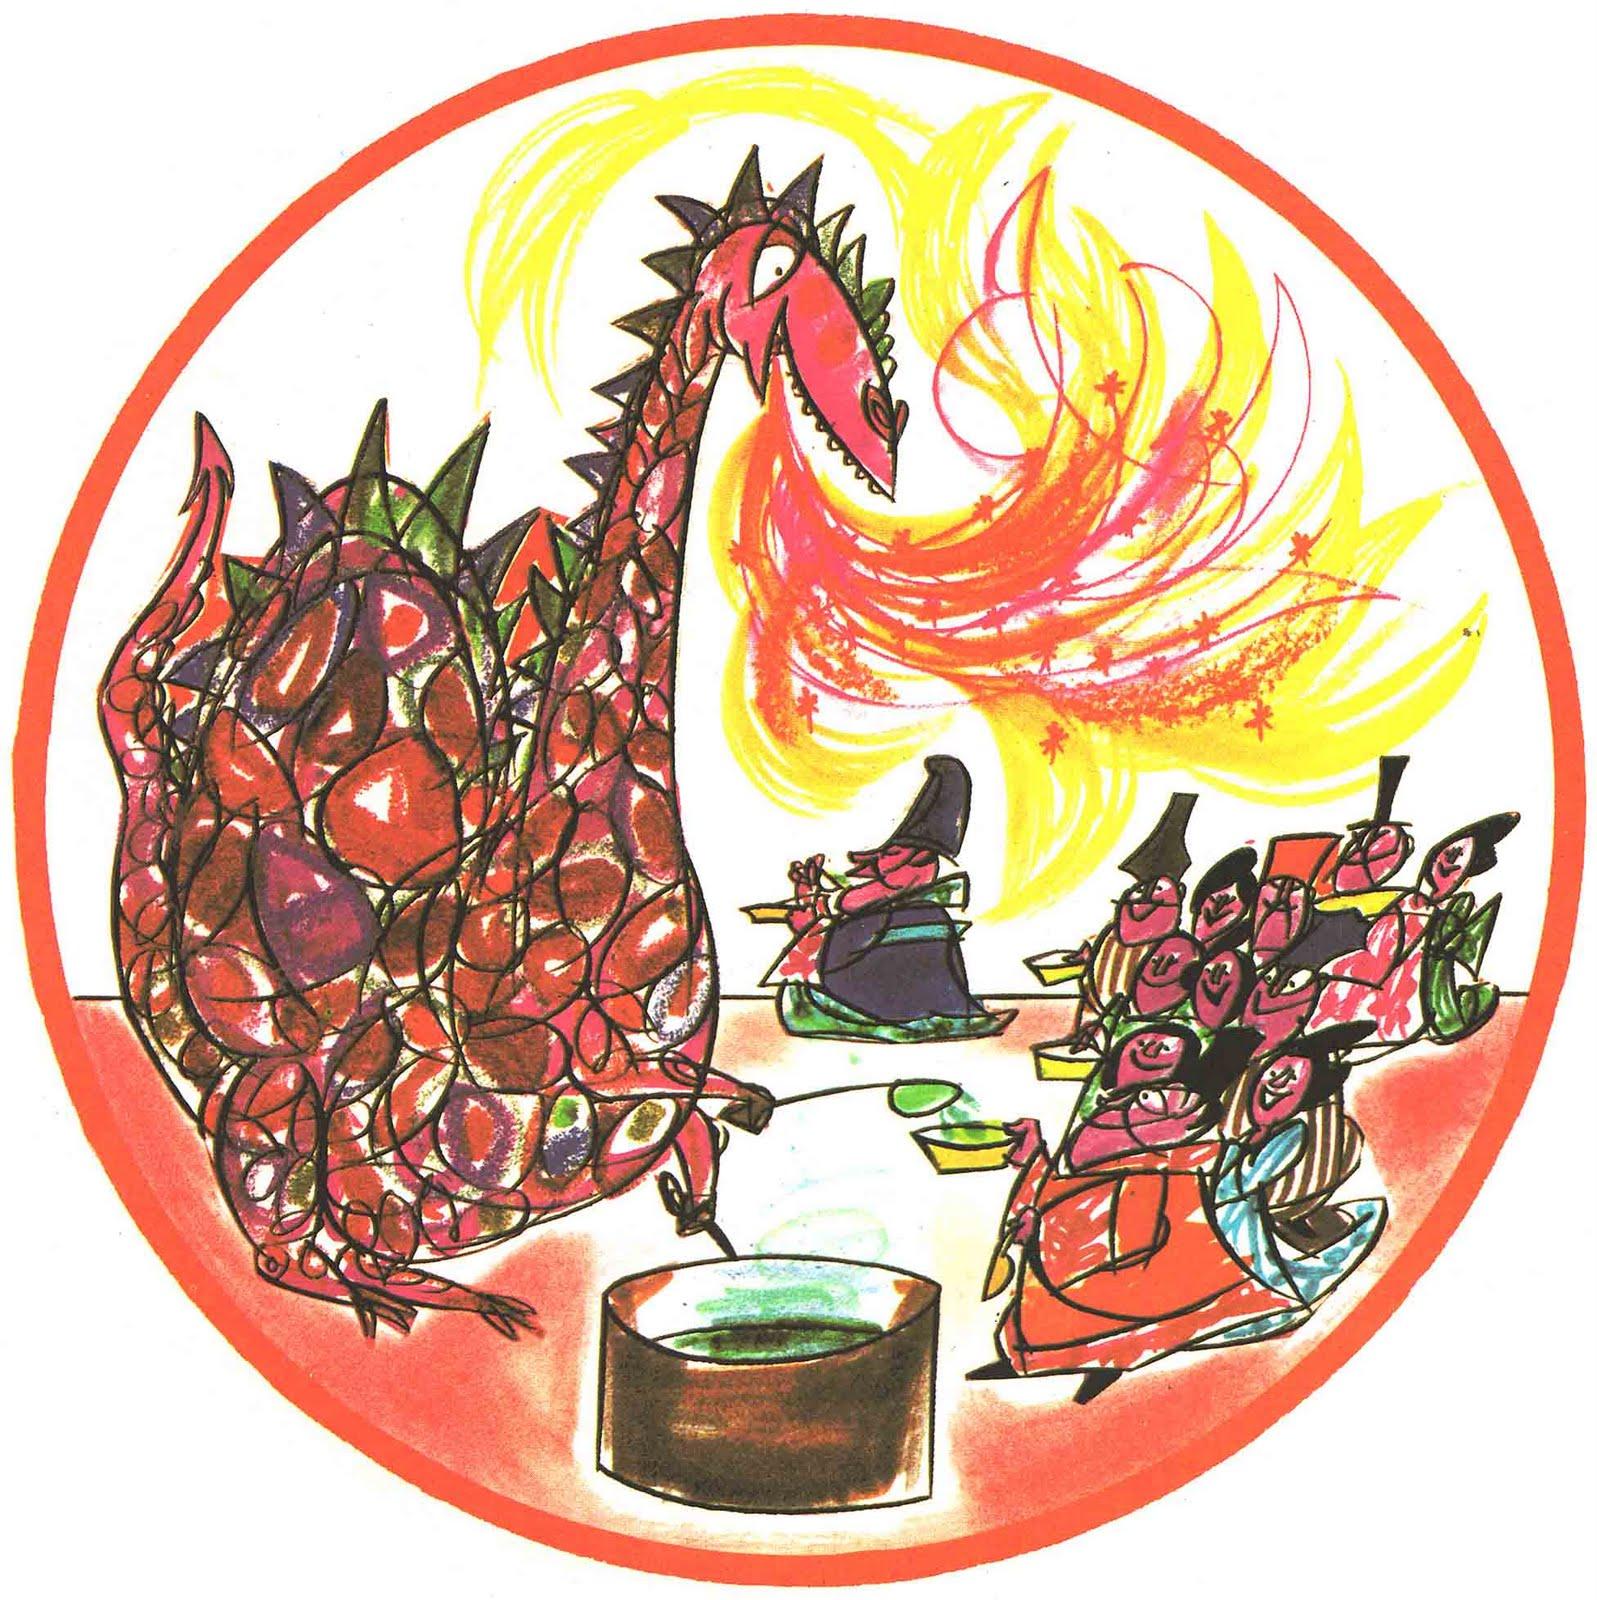 Laughing dragon photo